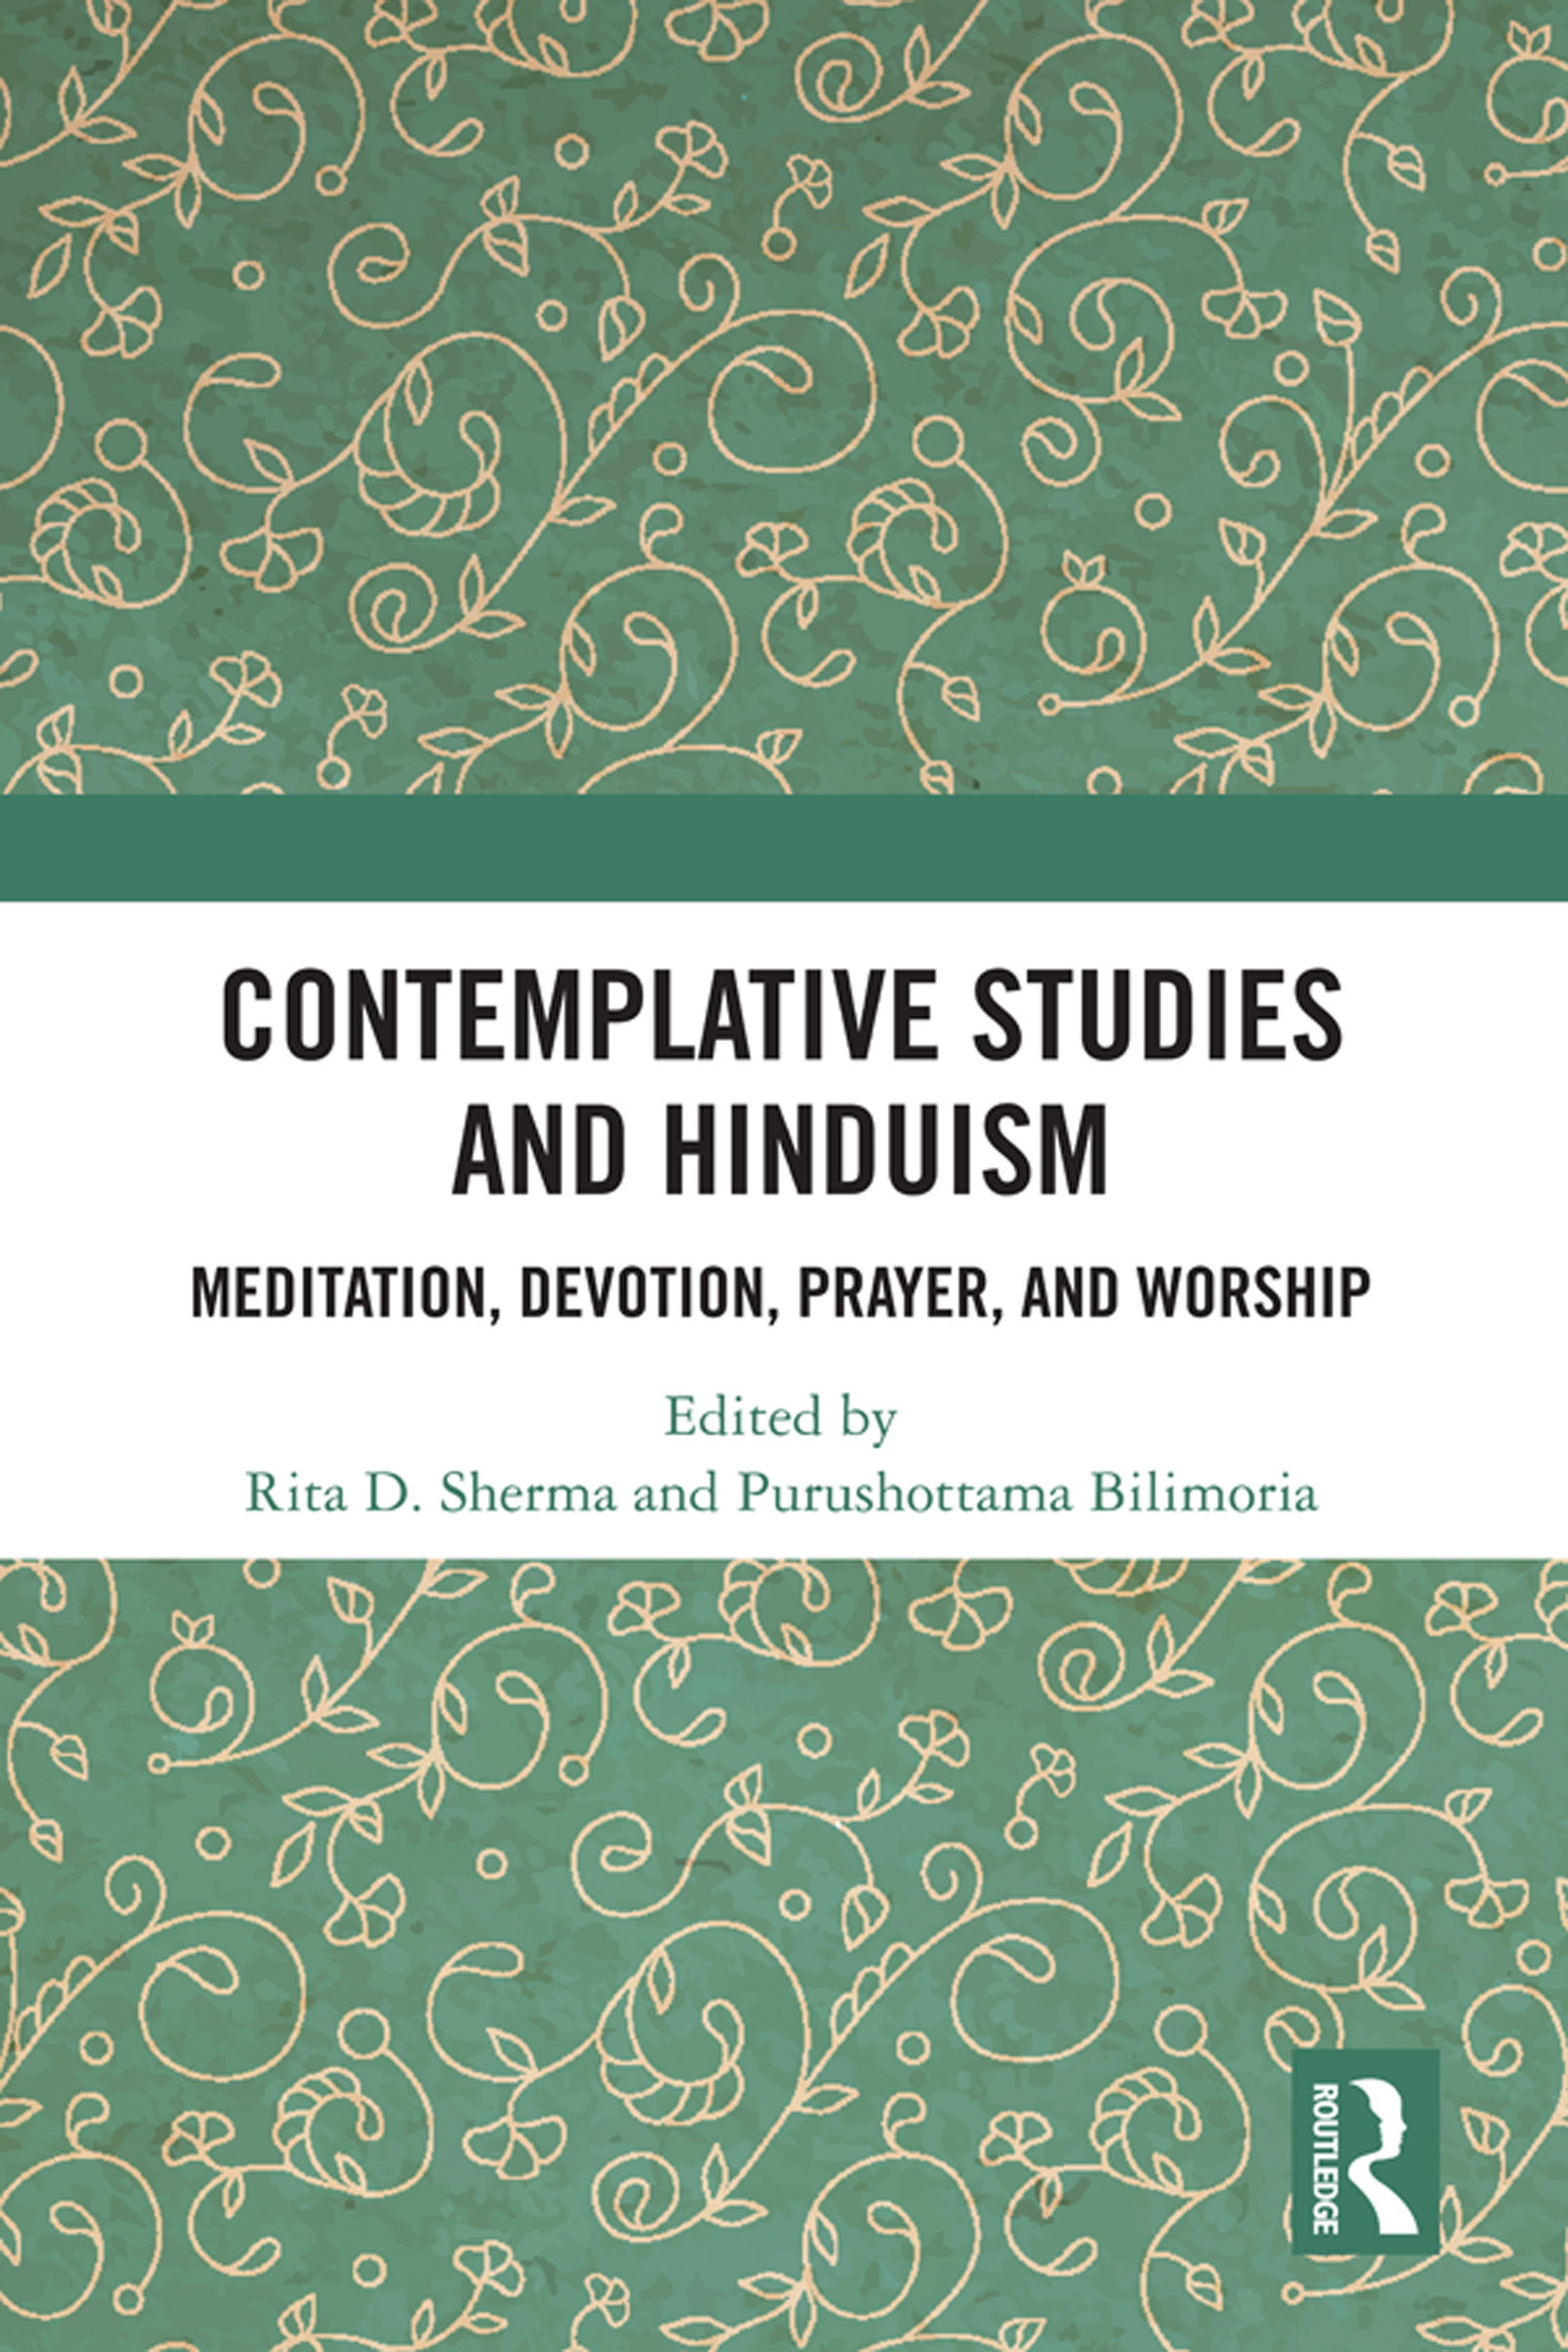 Contemplative Studies and Hinduism